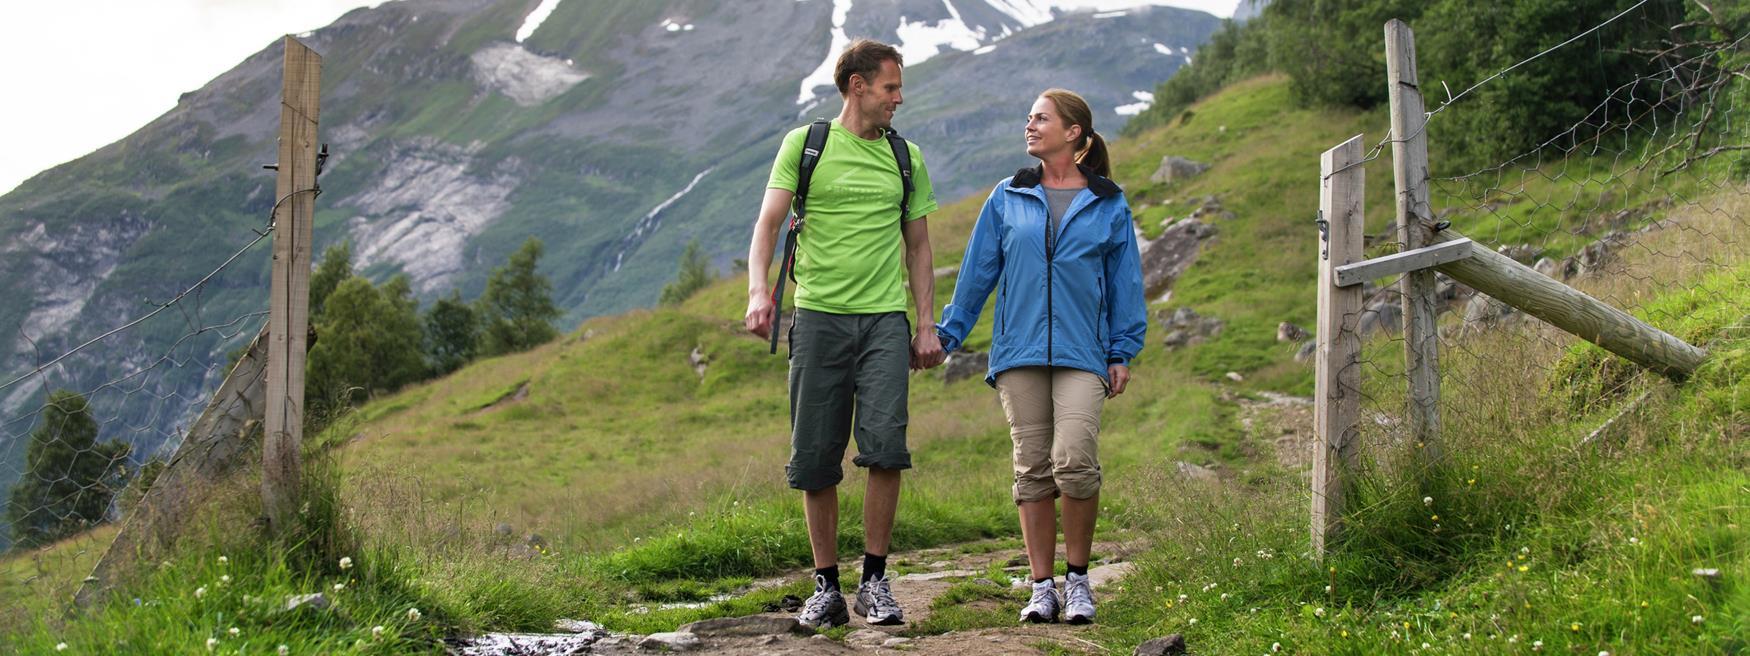 Best Convertible Hiking Pants For Men & Women